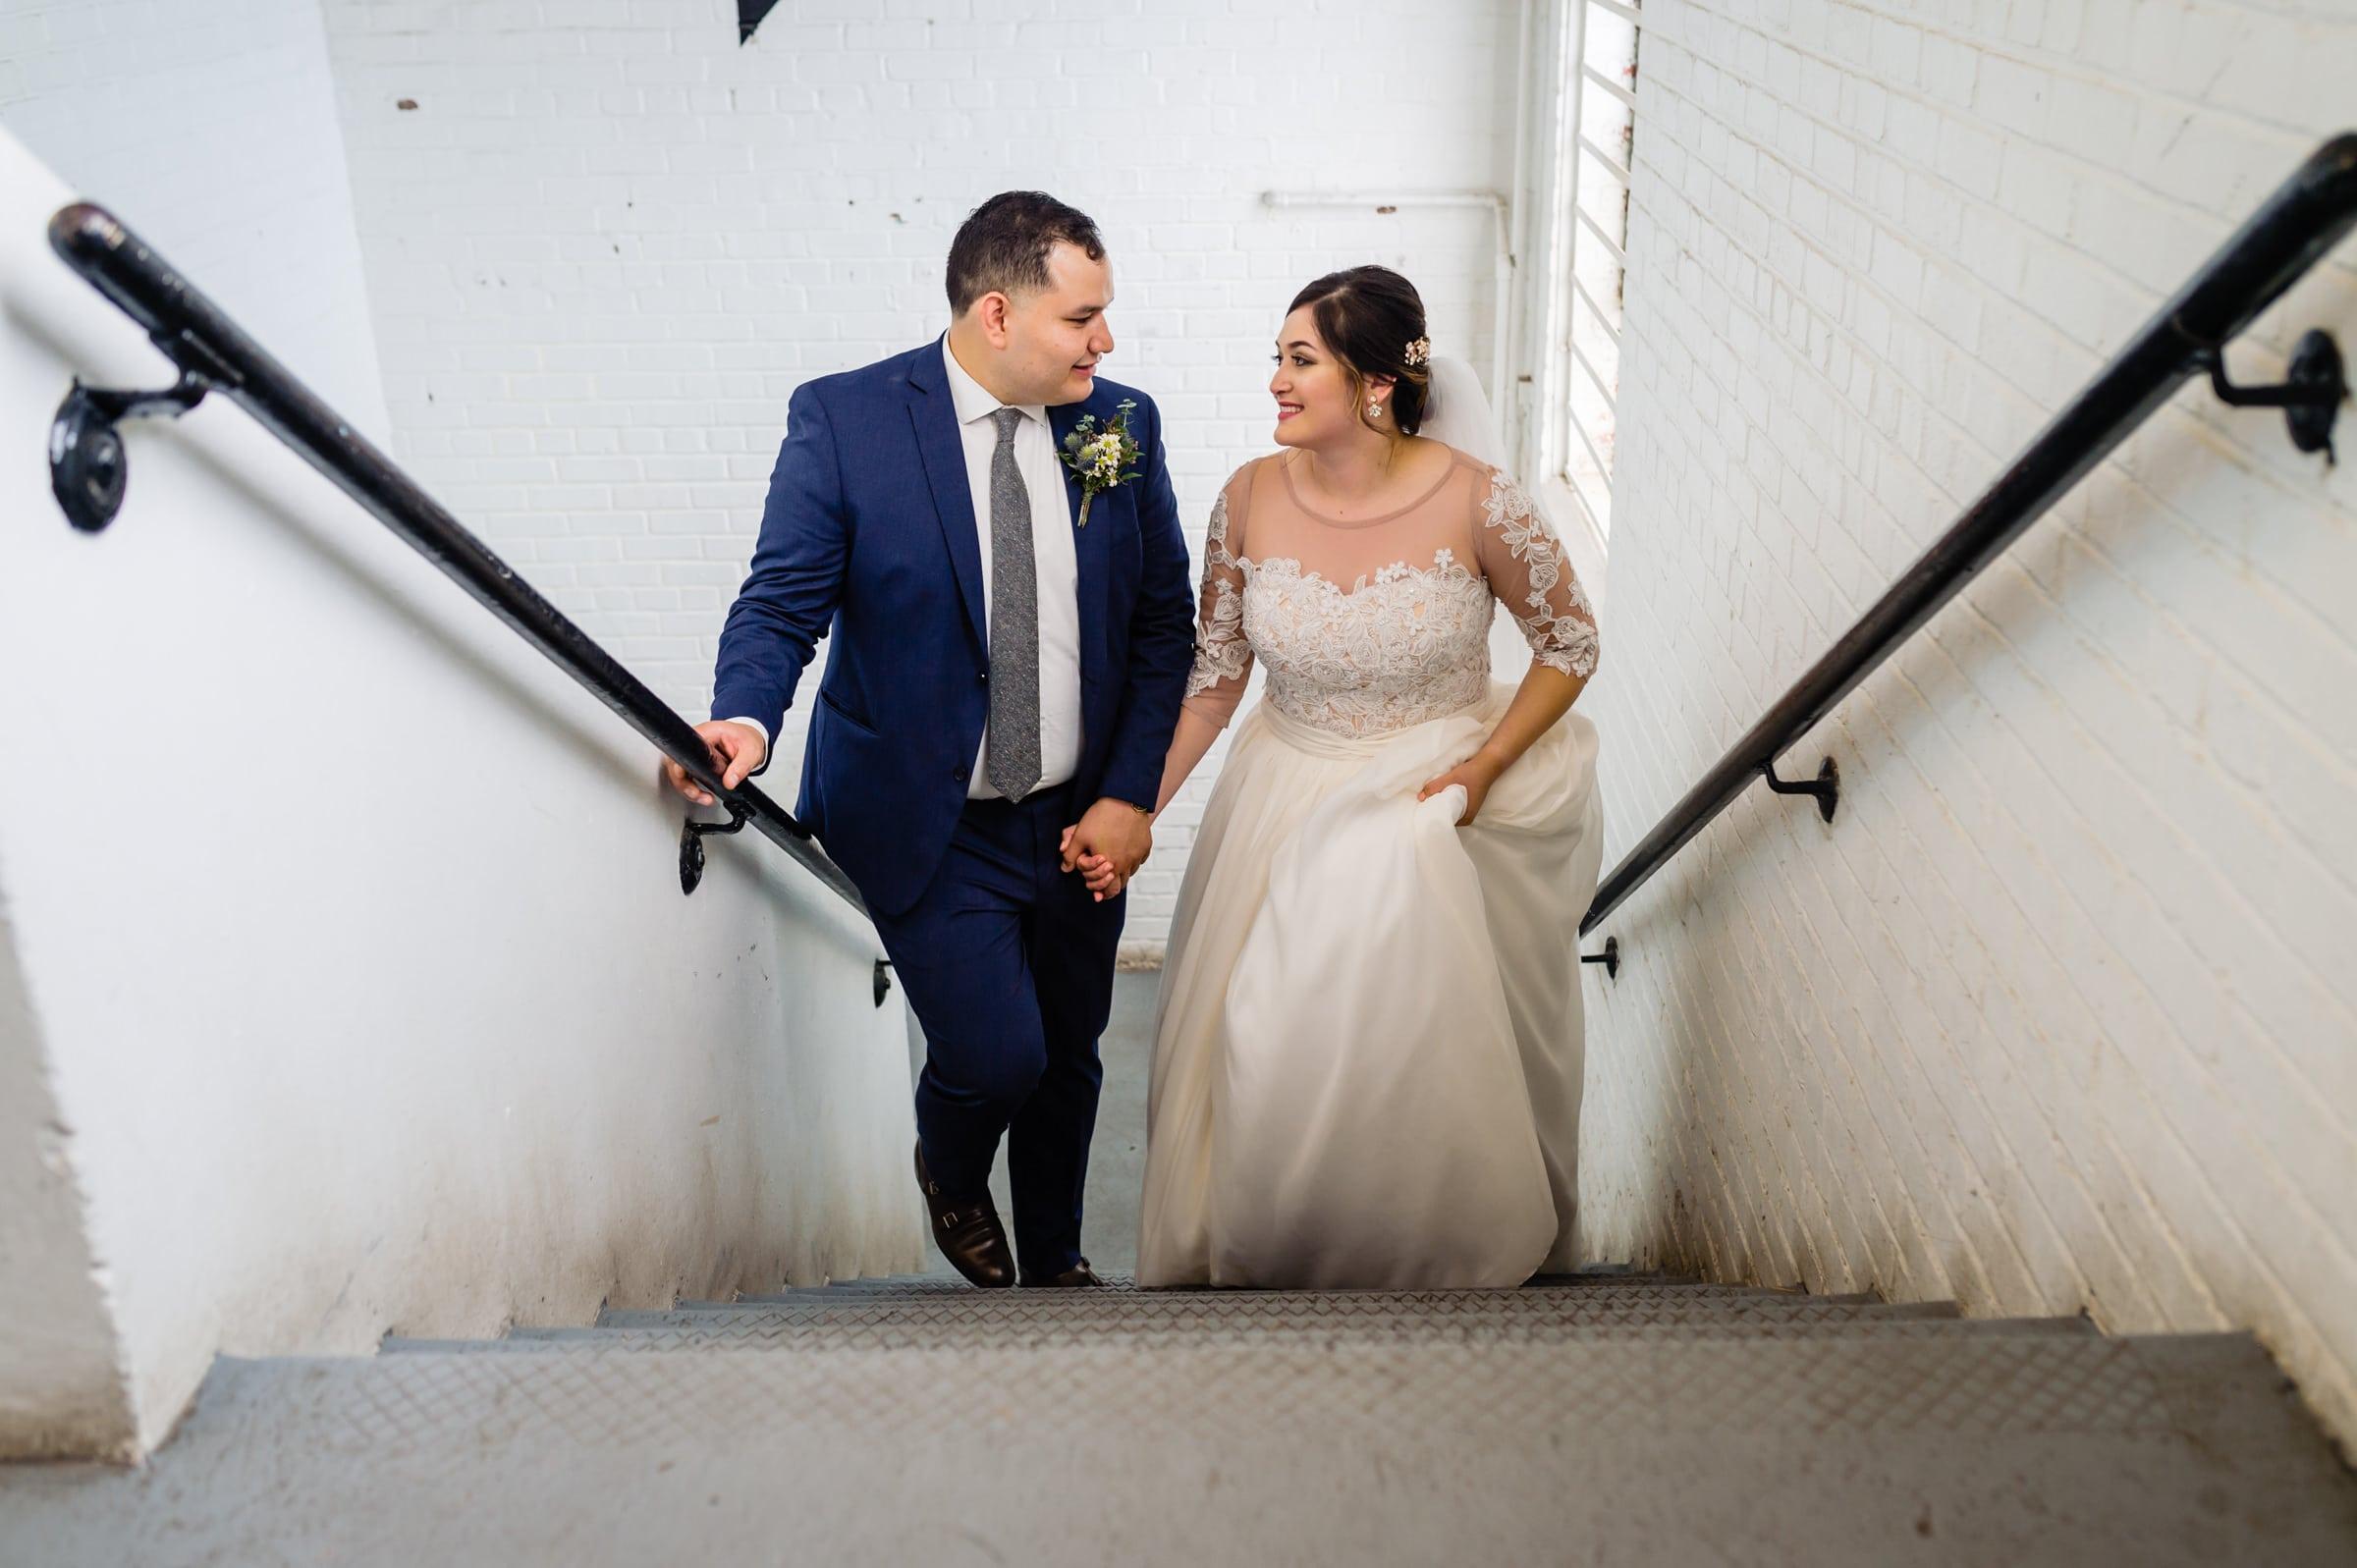 Bride Groom running up stairs